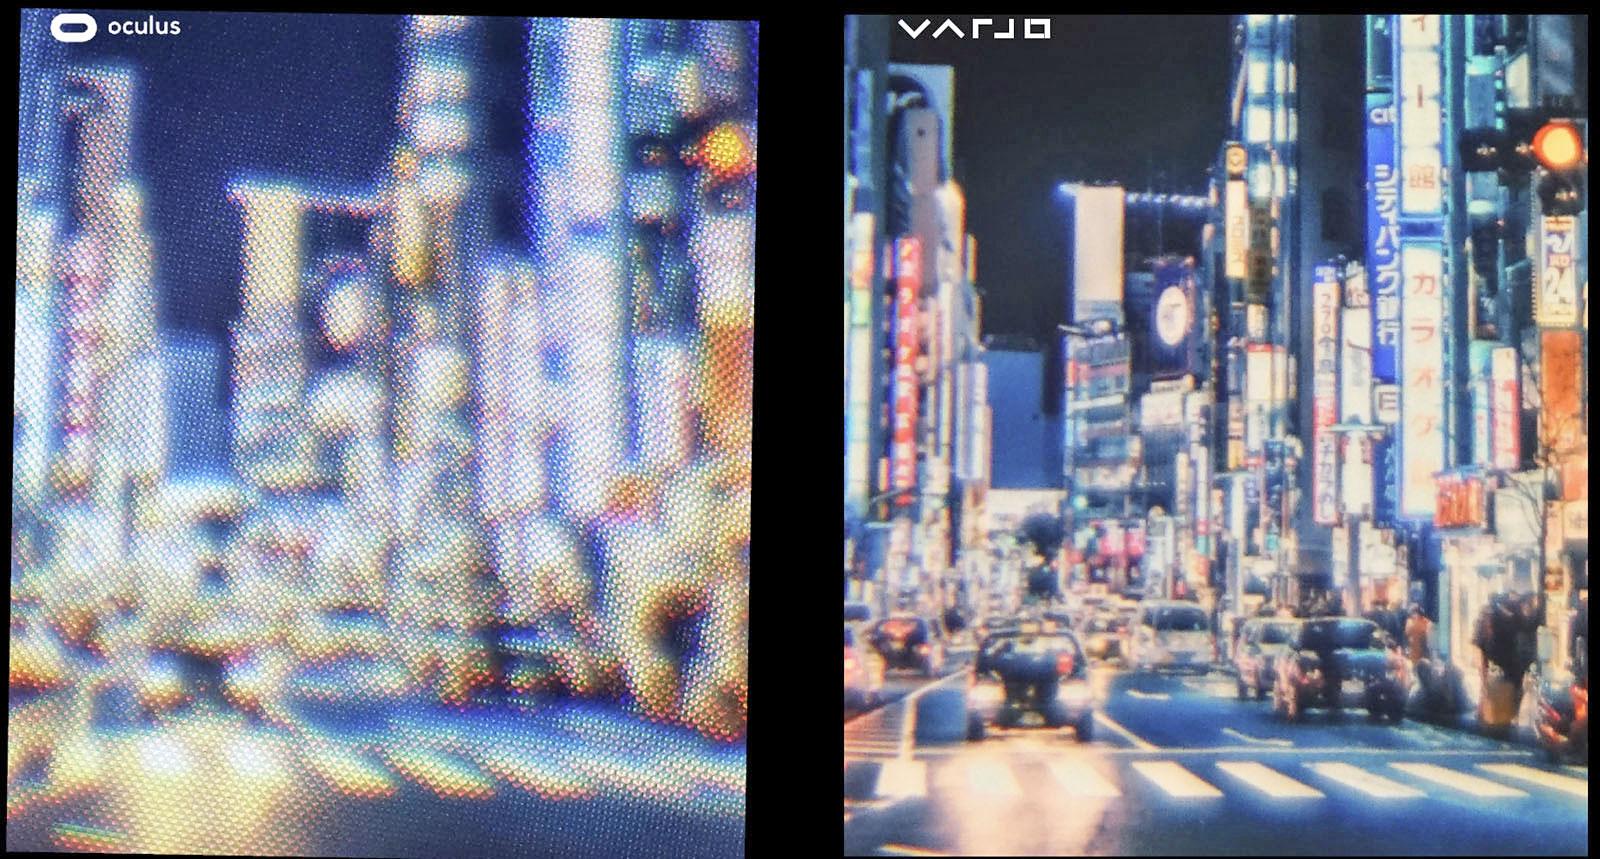 Картинки по запросу Varjo 20|20